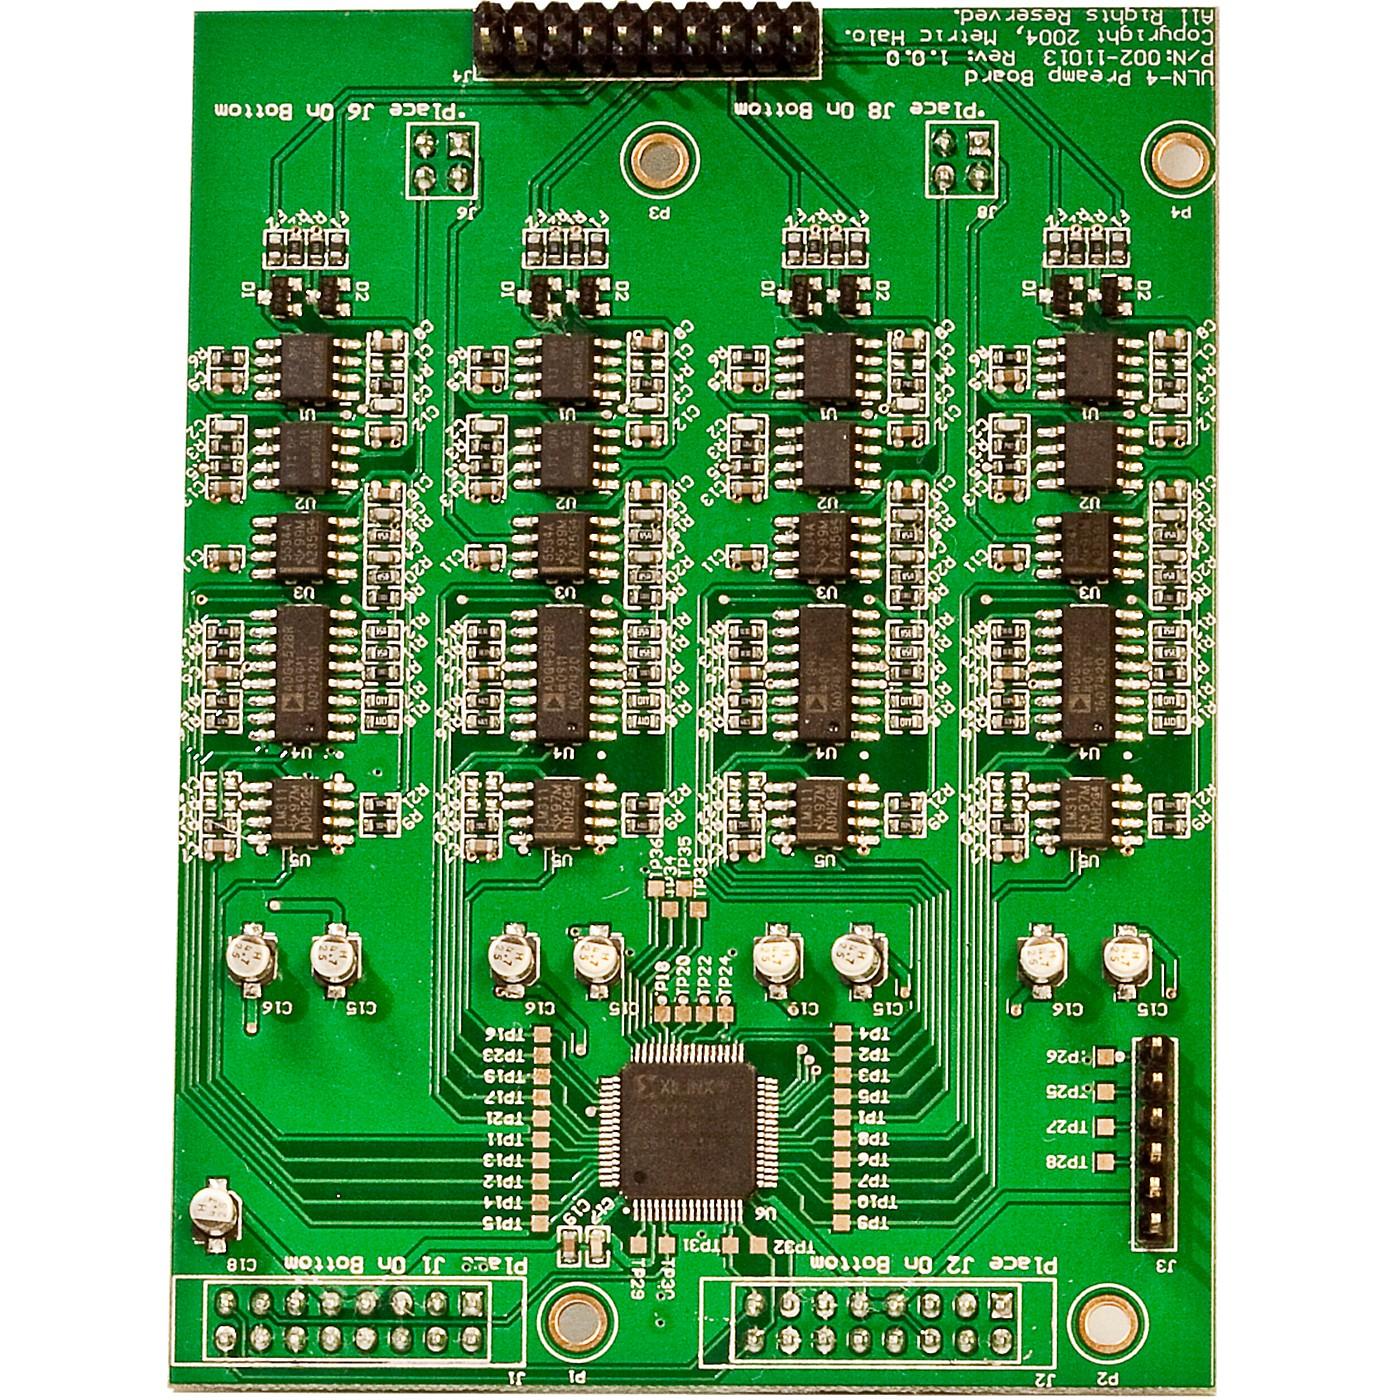 METRIC HALO LIO-8 4 Channel (5-8) ULN-R Preamp Kit thumbnail